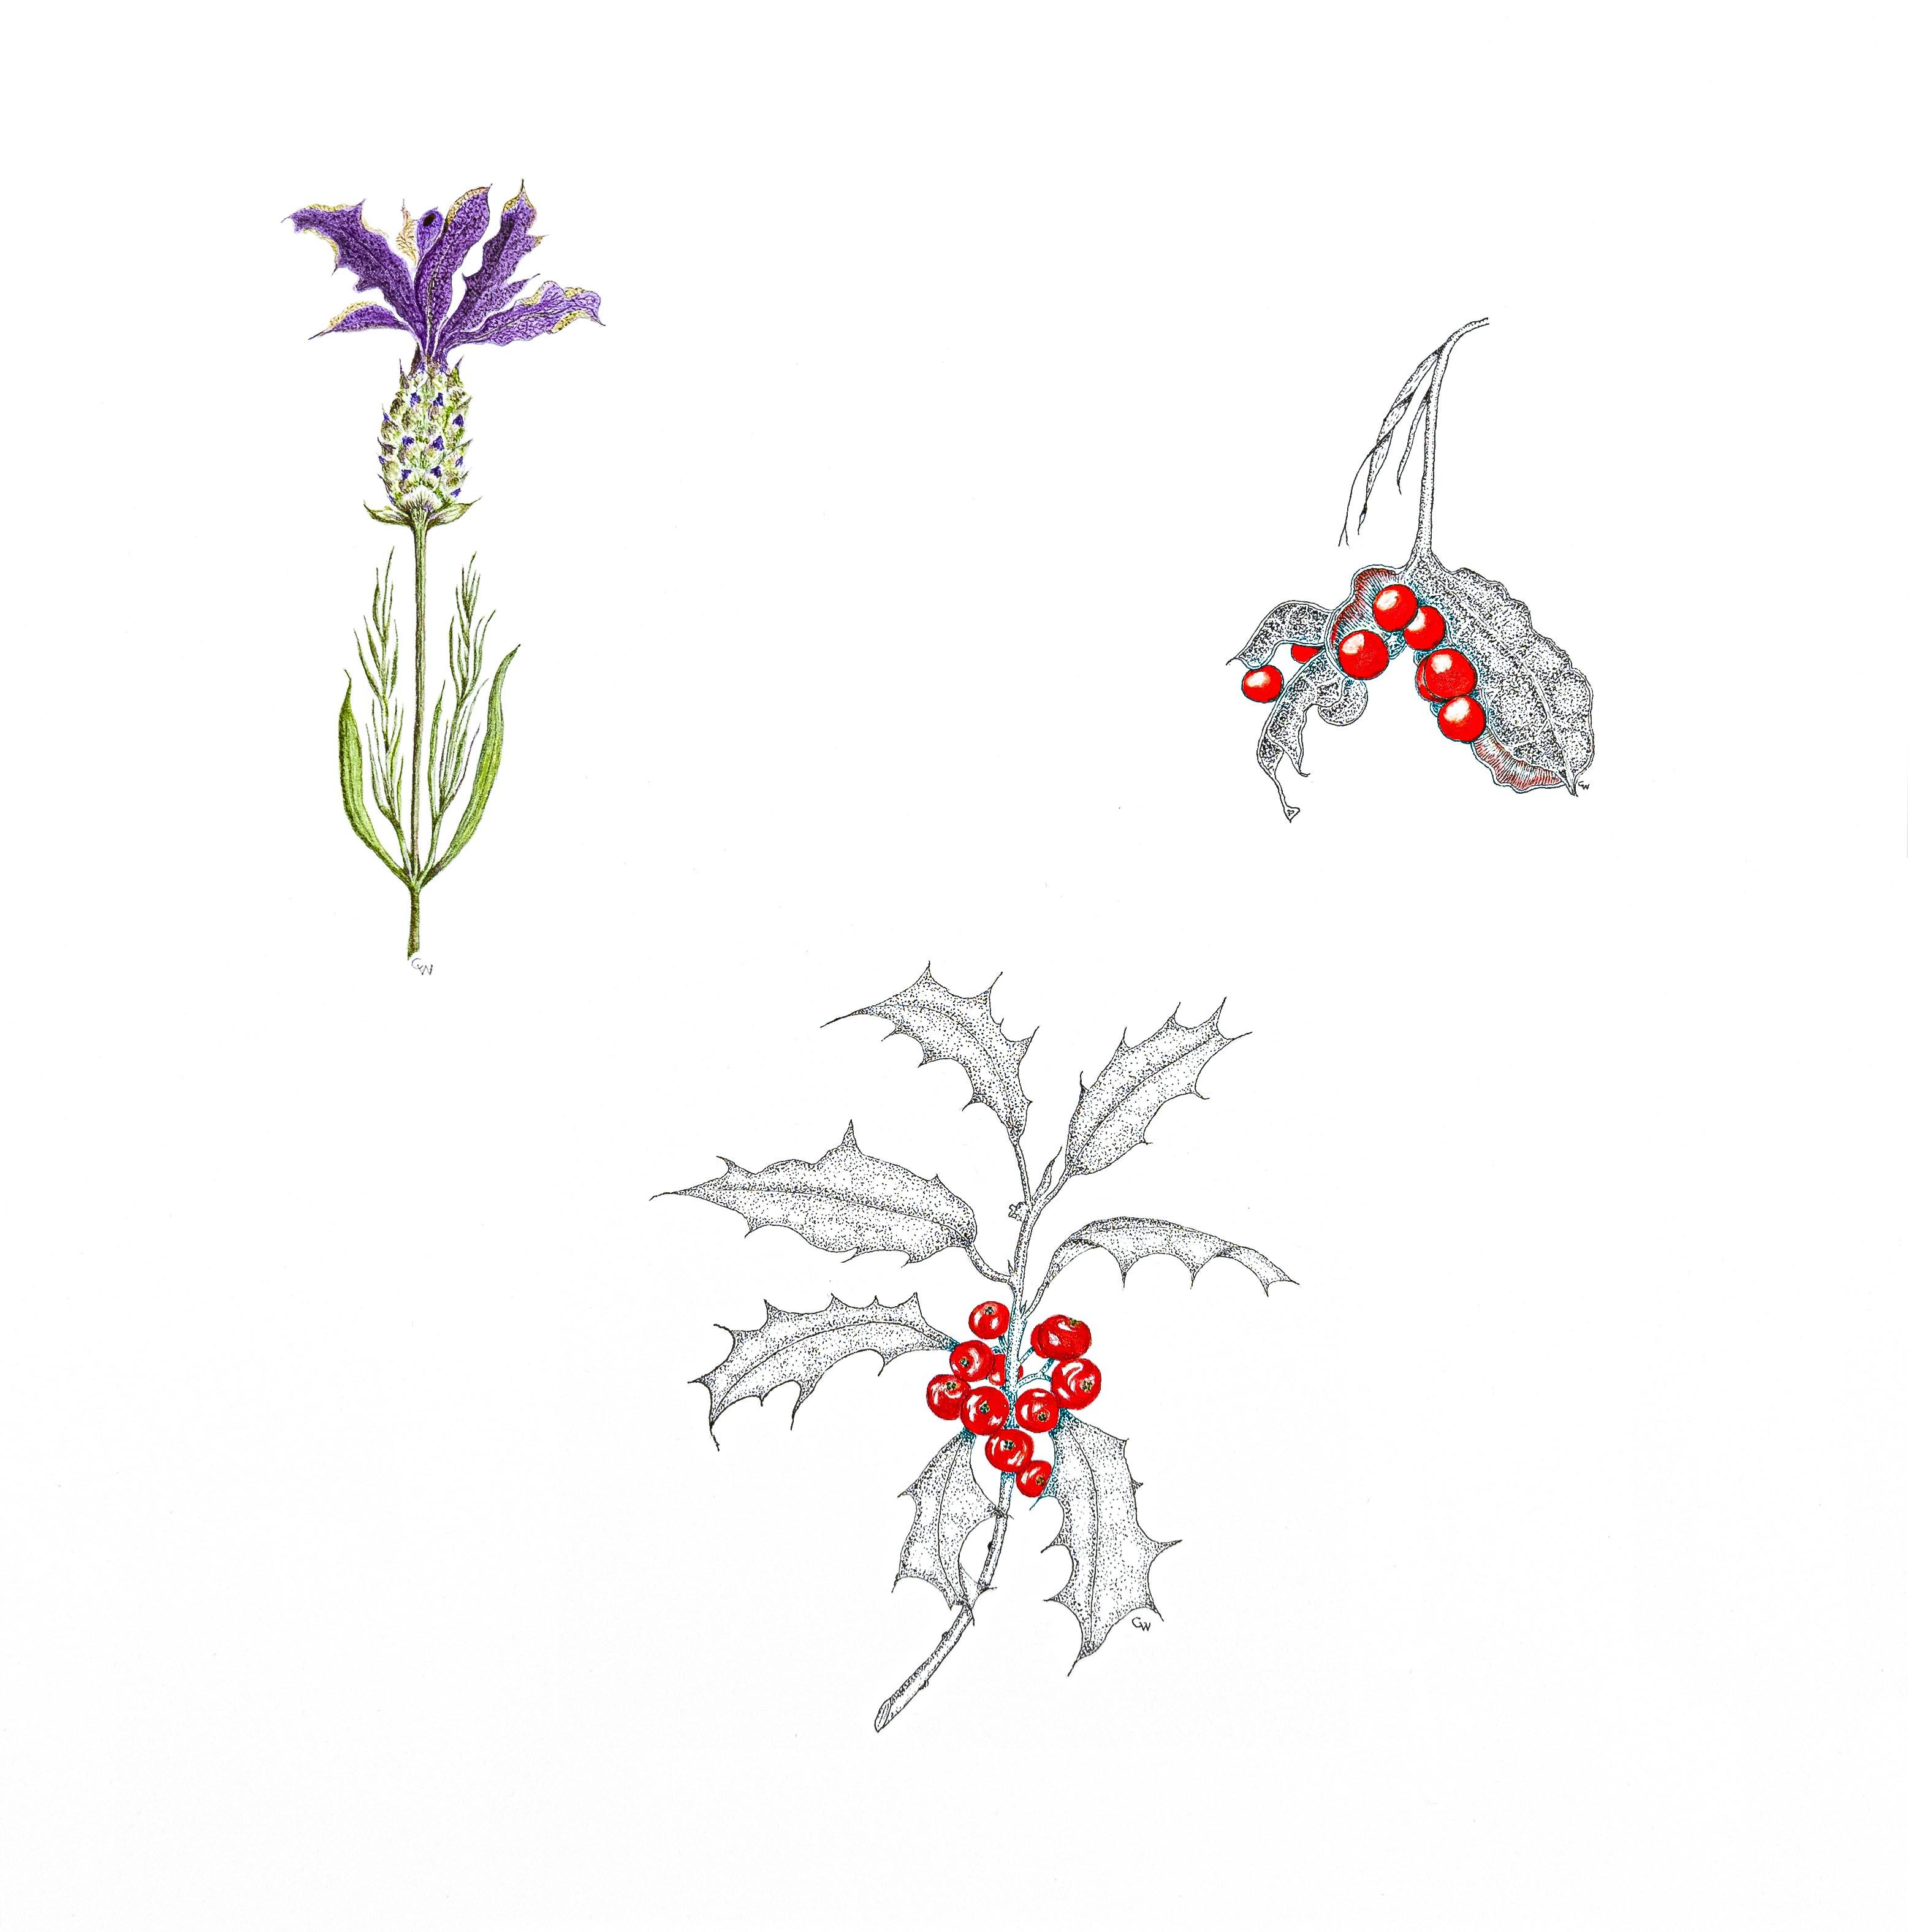 Ilex, Iris foetidissima, Lavendula